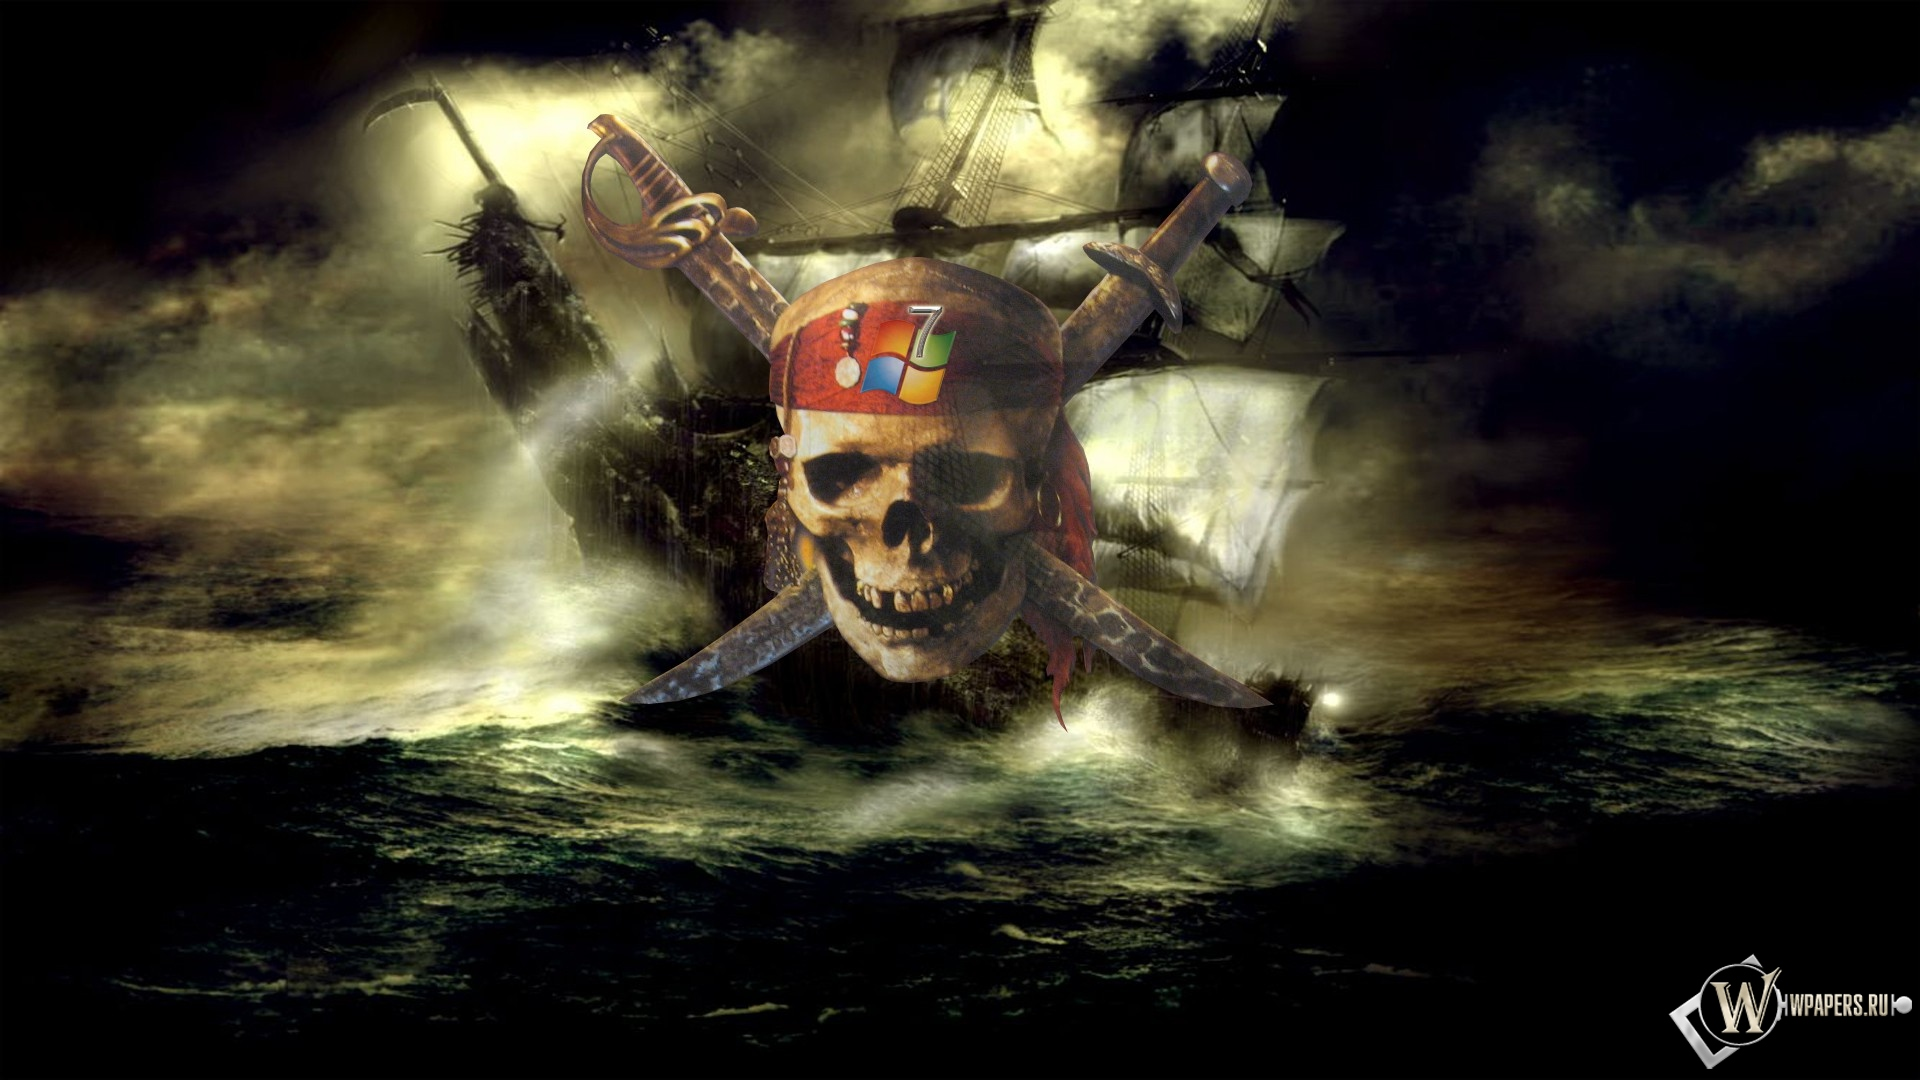 Пираты карибского моря 1920x1080